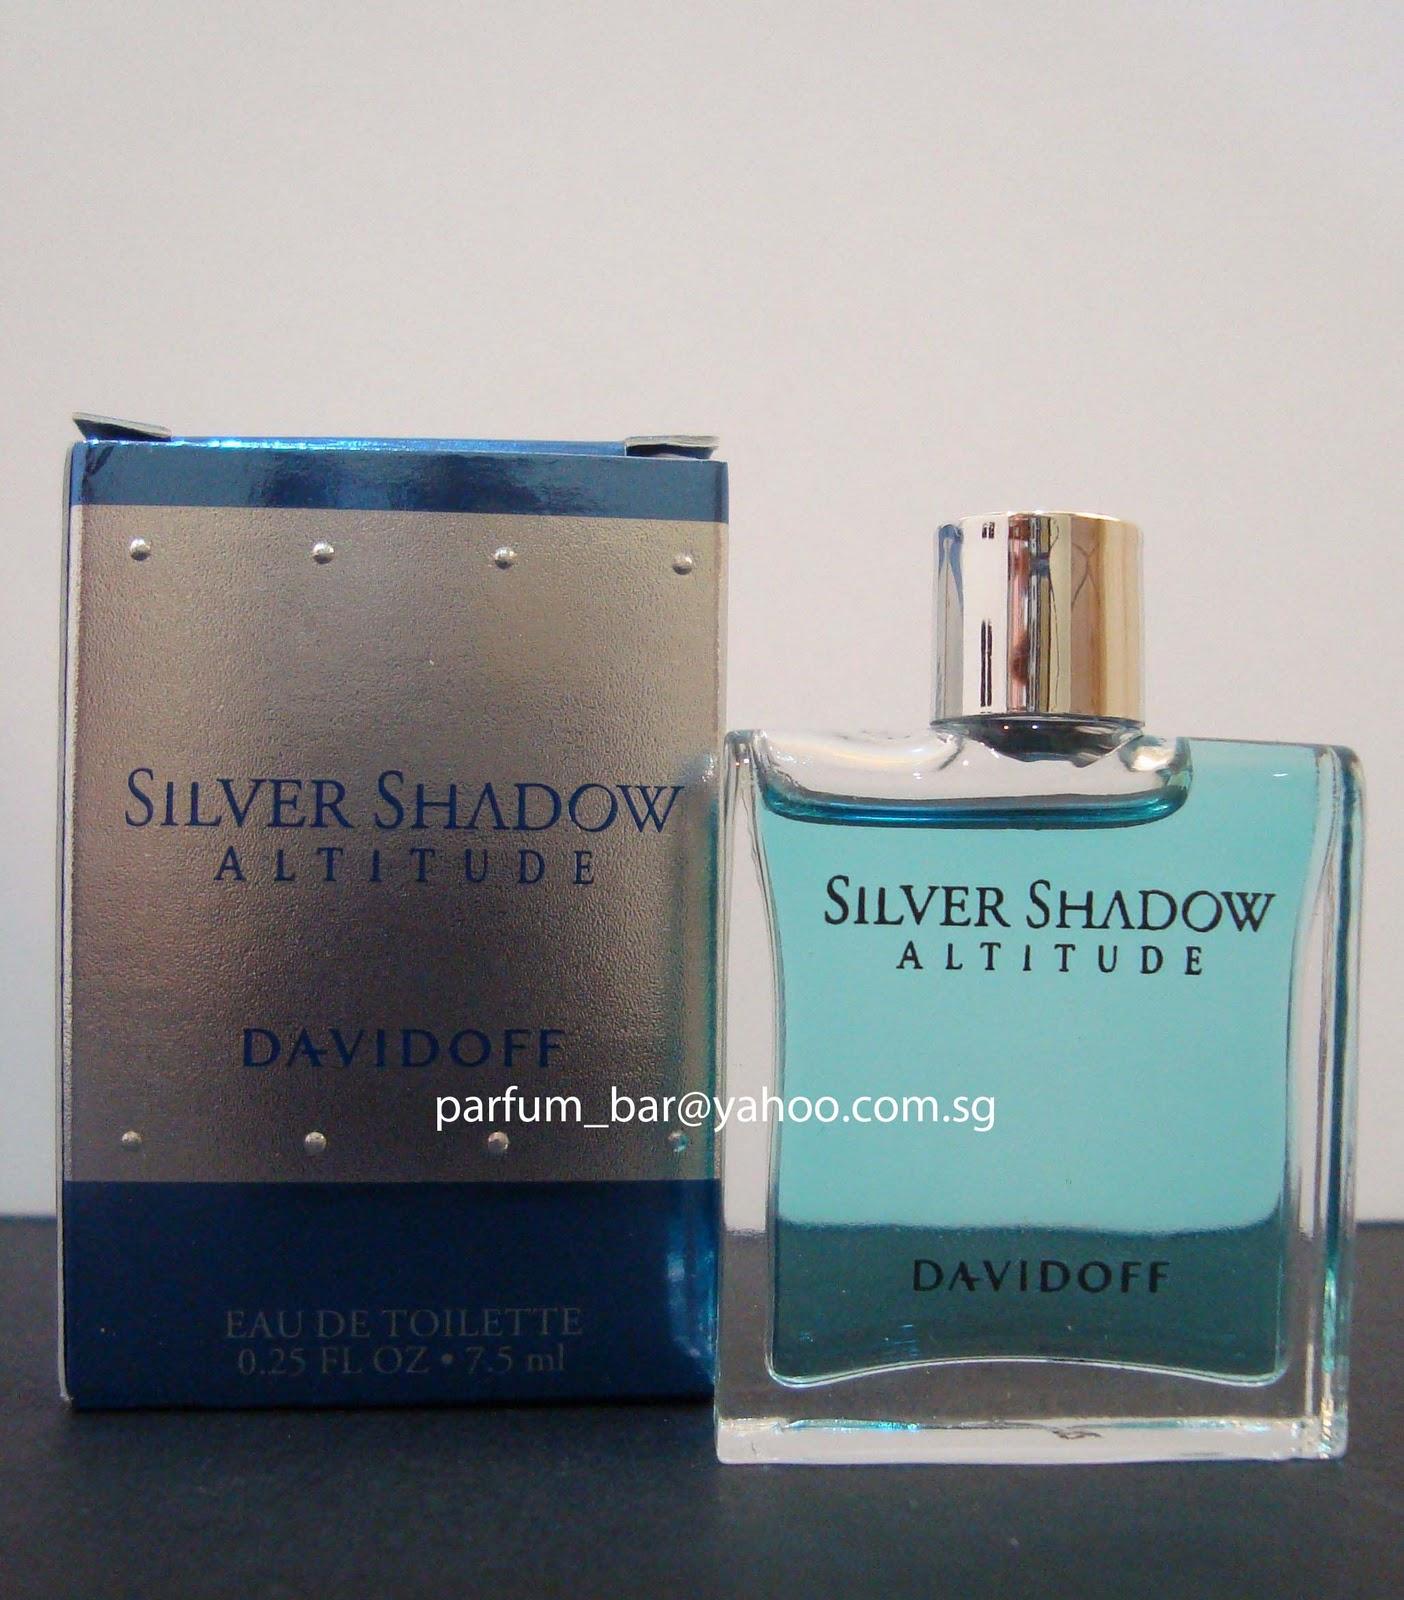 Parfum Bar Davidoff Silver Shadow Altitude